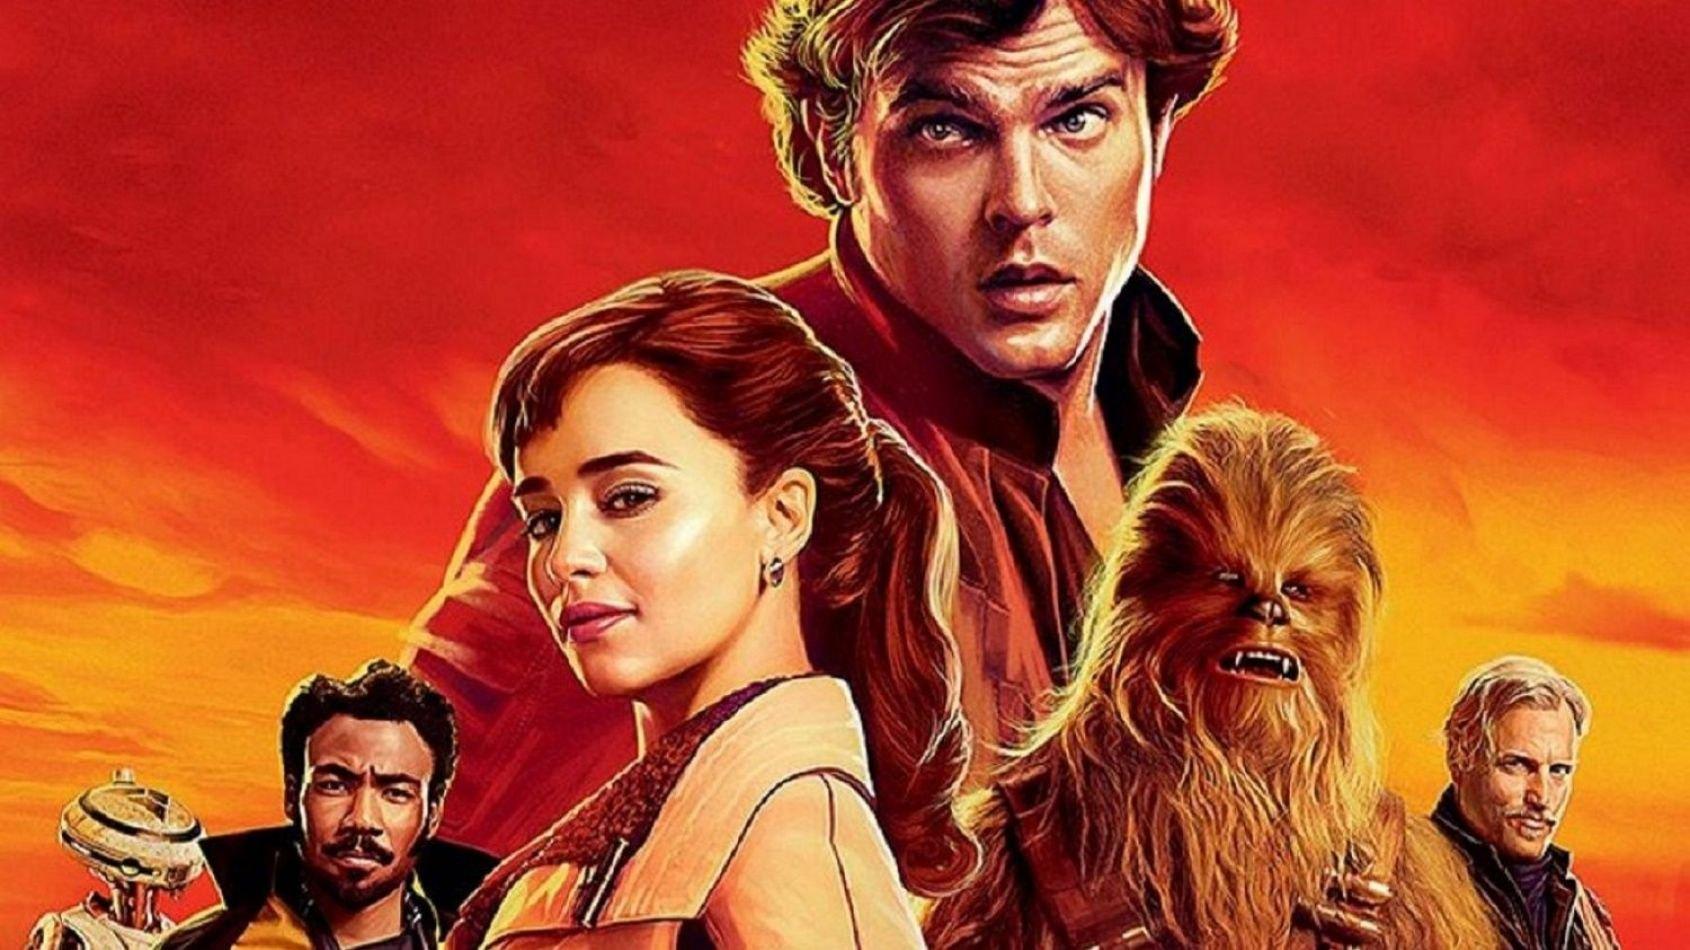 Des informations sur des cameos de Solo A Star Wars Story